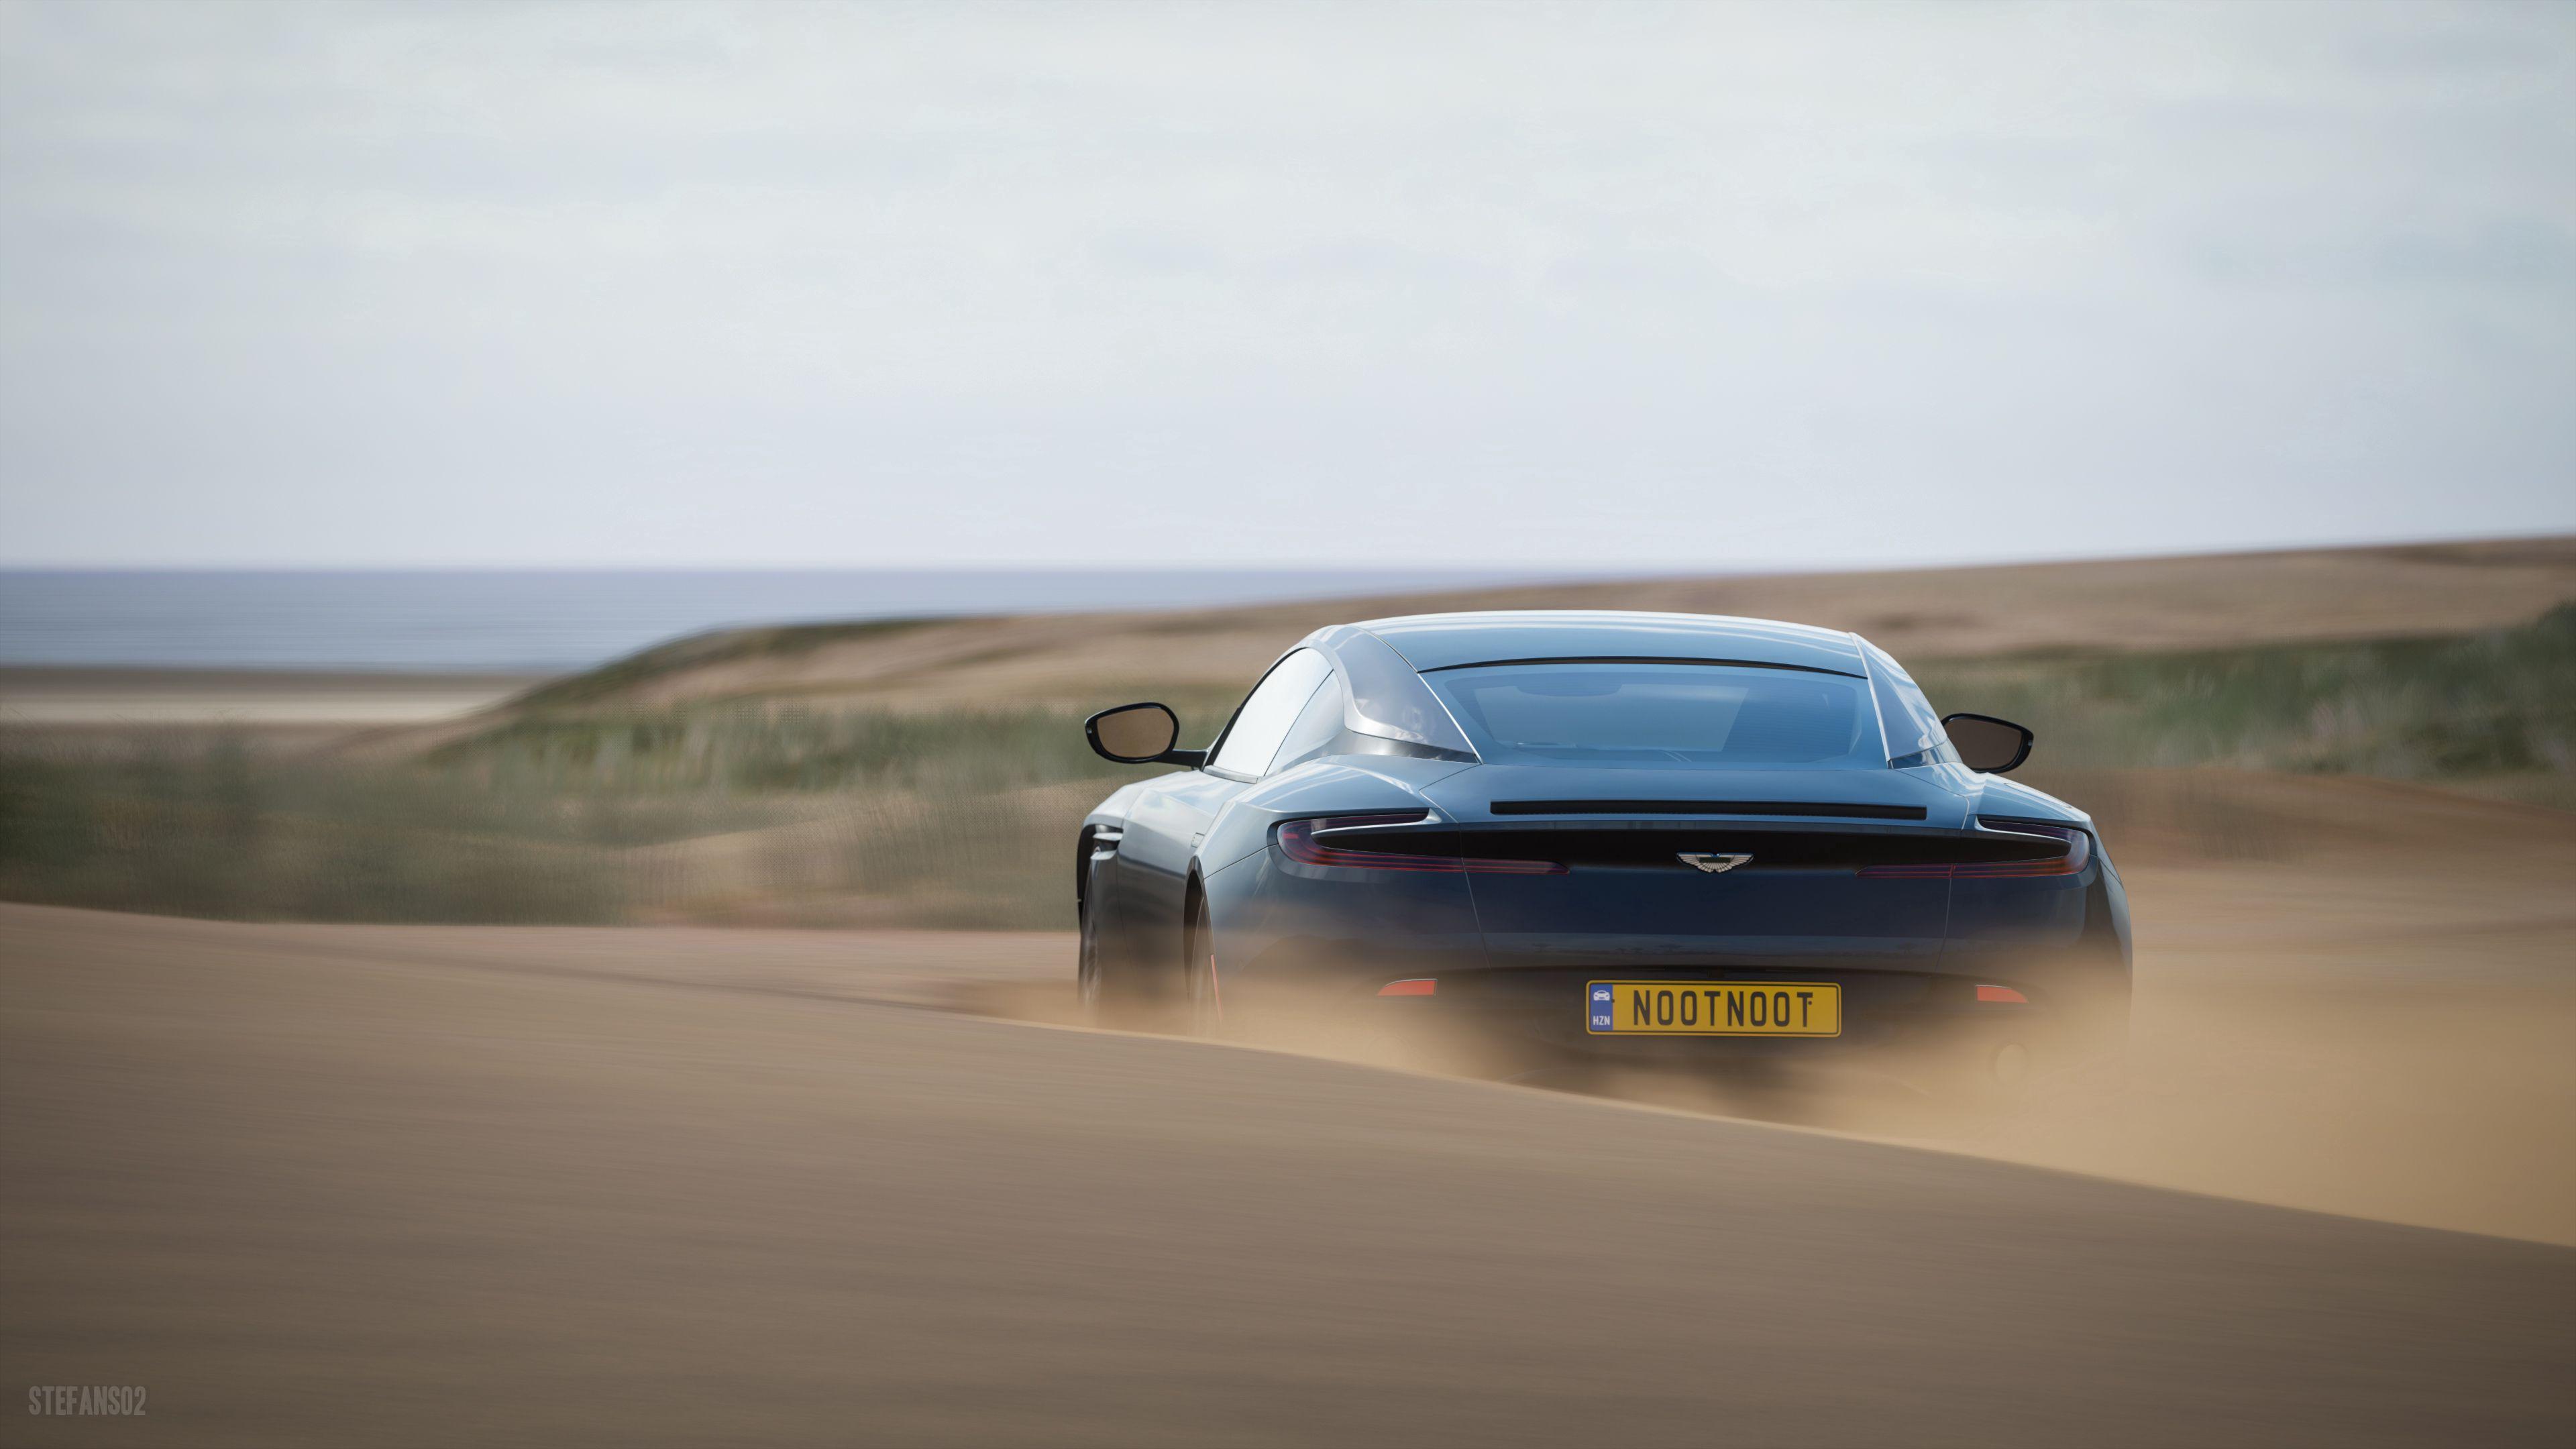 77751 Заставки и Обои Пустыня на телефон. Скачать Пустыня, Песок, Астон Мартин (Aston Martin), Тачки (Cars), Синий, Спорткар, Вид Сзади, Aston Martin Db11 картинки бесплатно